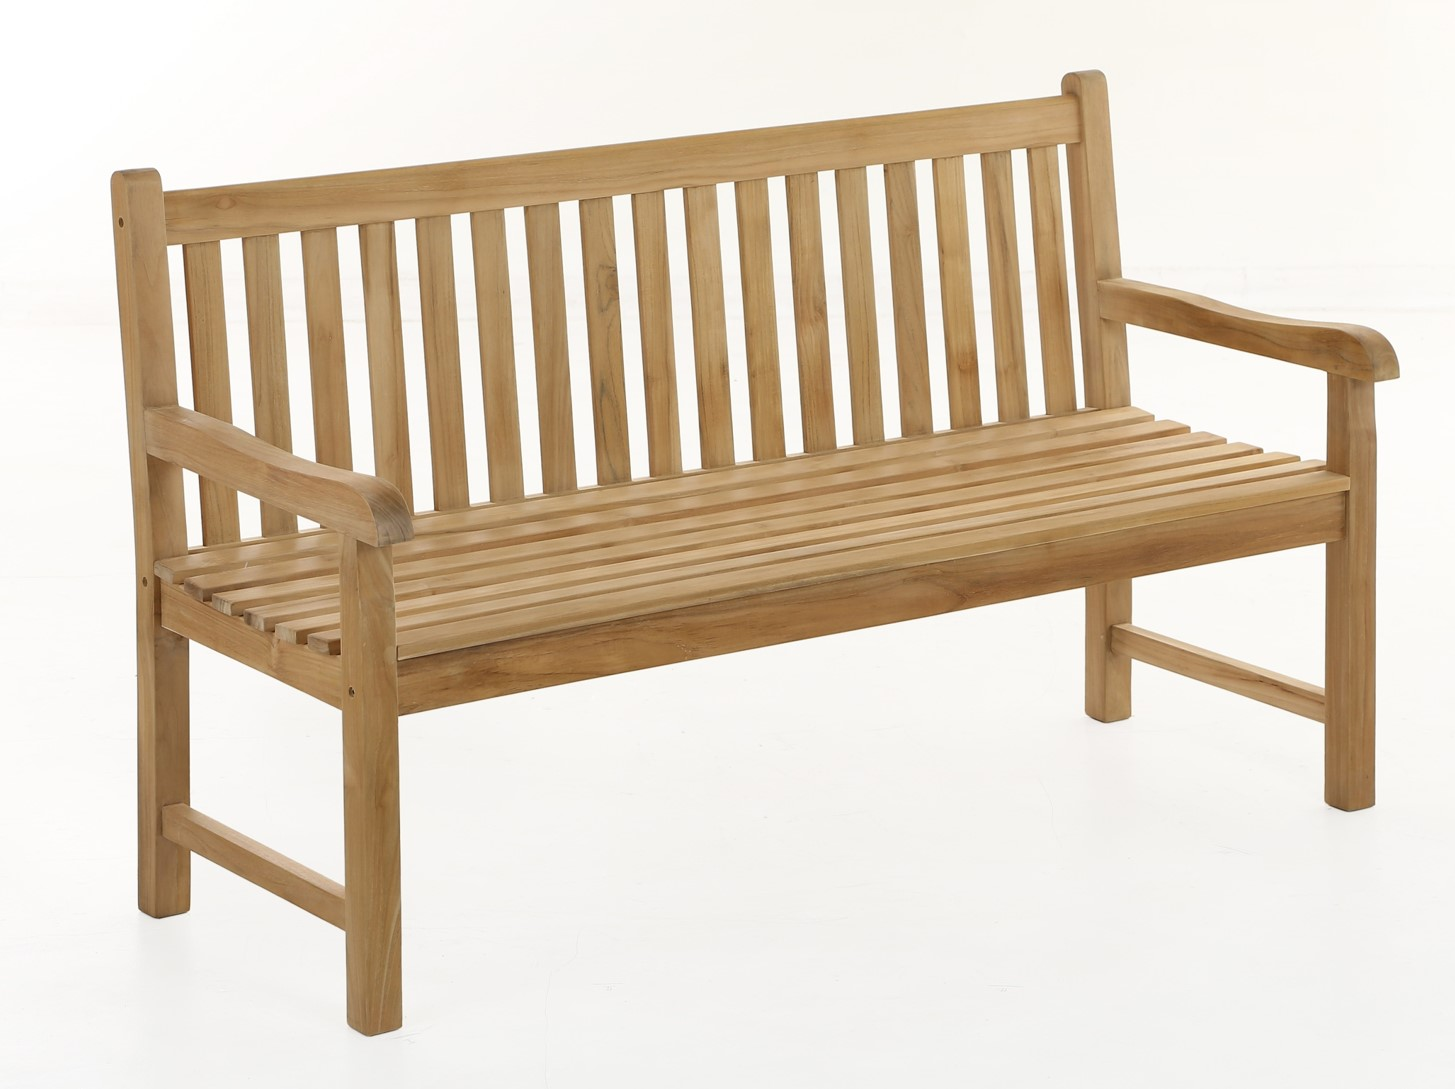 Picture of: Teak Java Bench Buy Outdoor Benches Teak Bench Garden Patio Bench Product On Alibaba Com